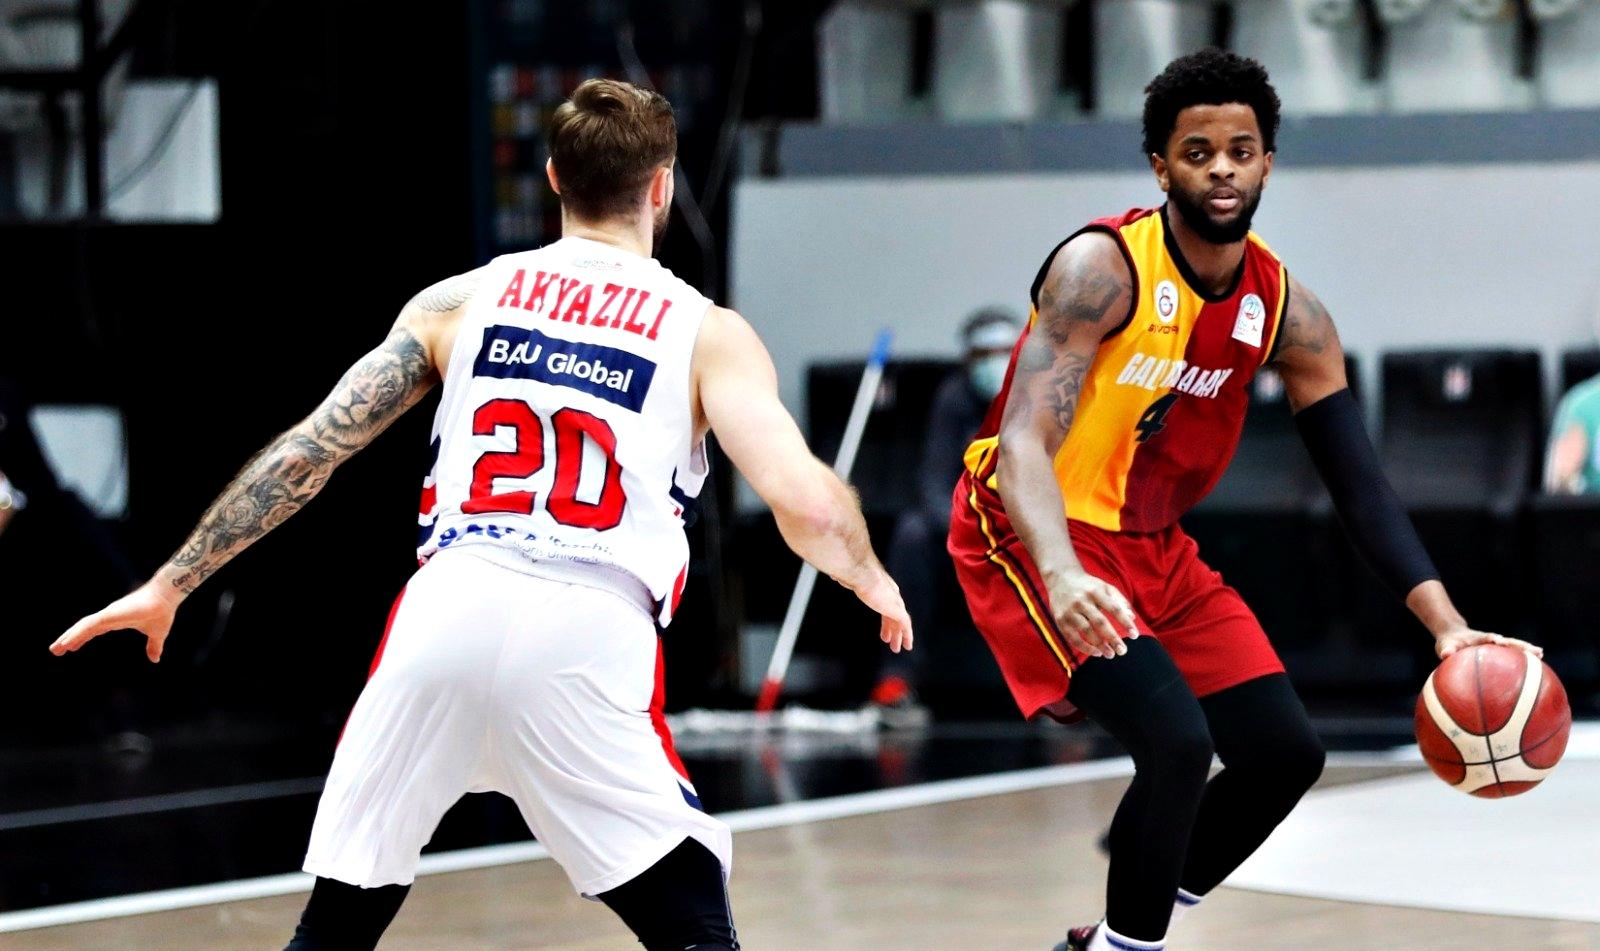 BSL   Galatasaray, Daryl Macon'un etkili oyunuyla Bahçeşehir'i yendi!